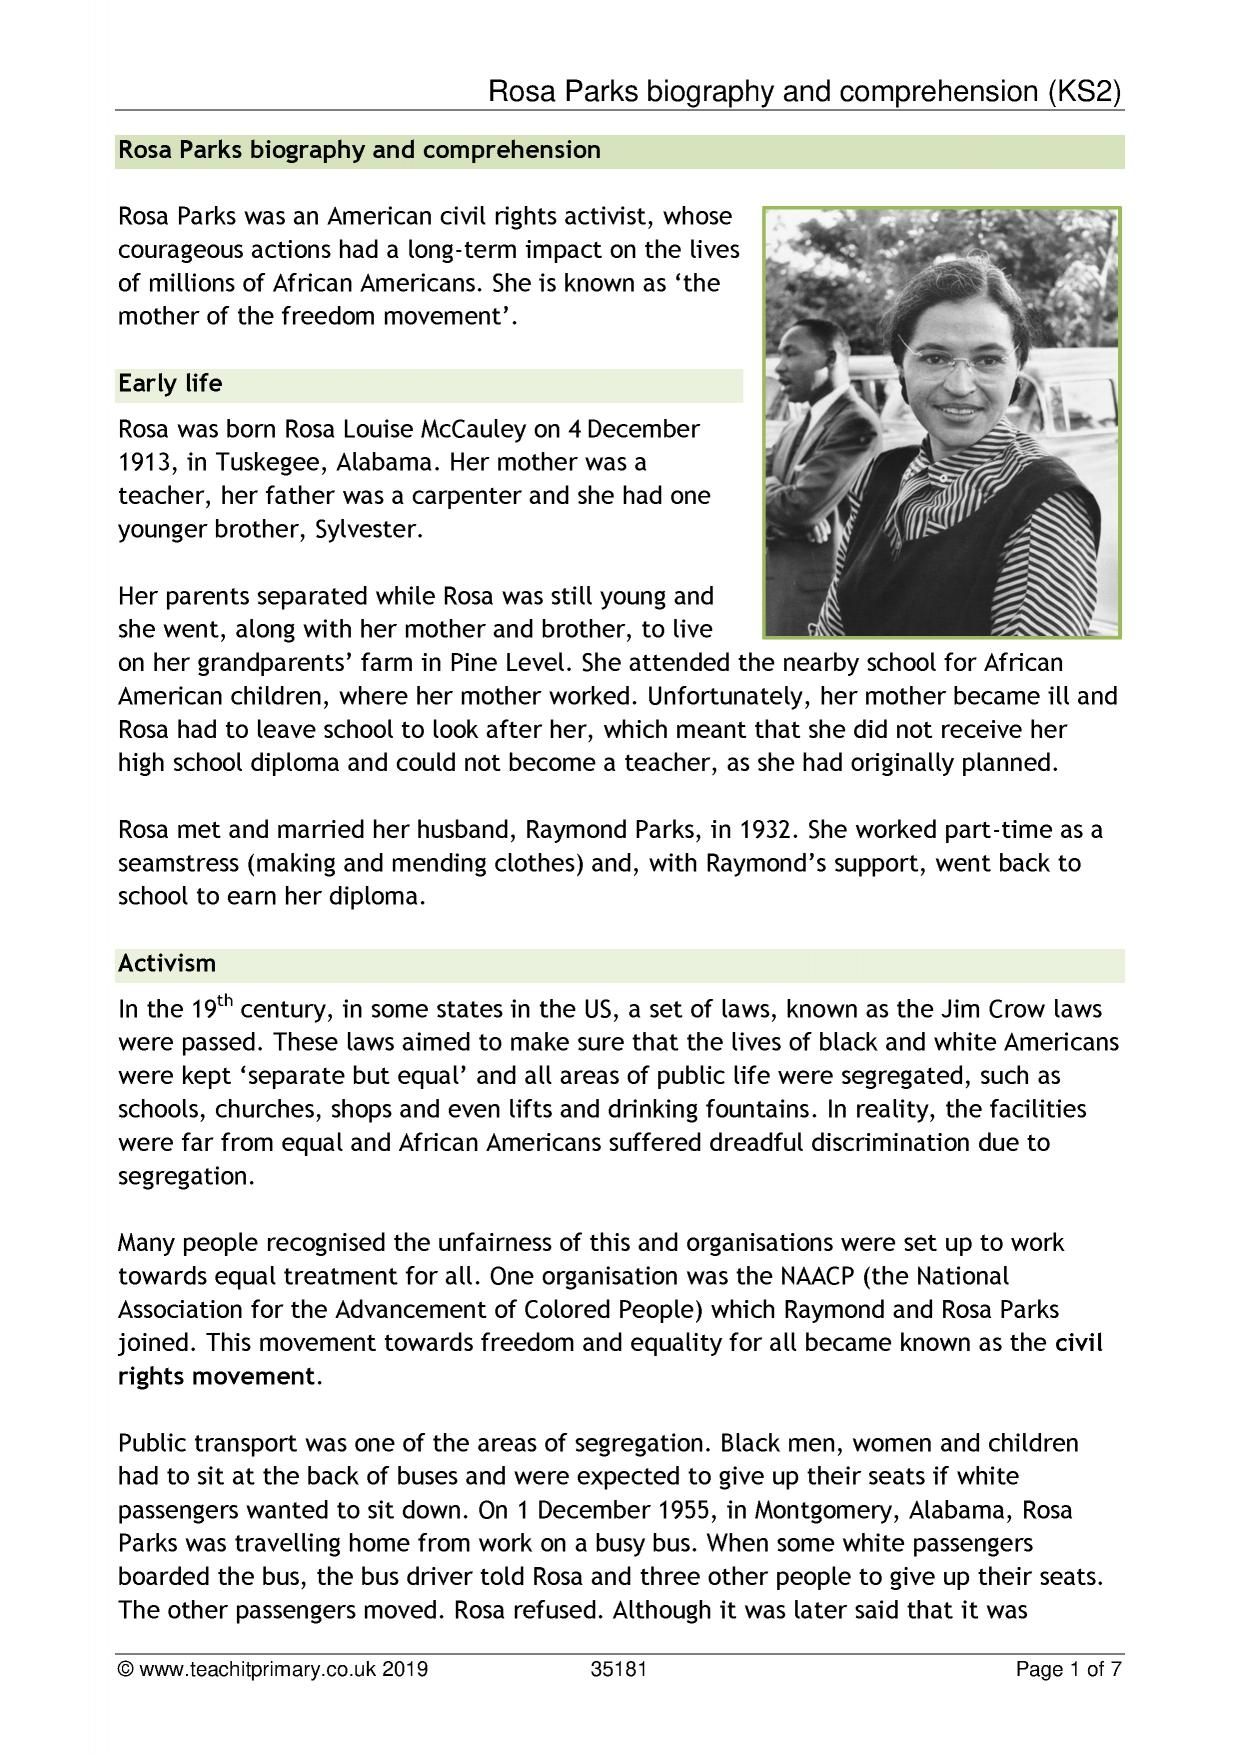 Rosa Parks Biography And Comprehension Ks2